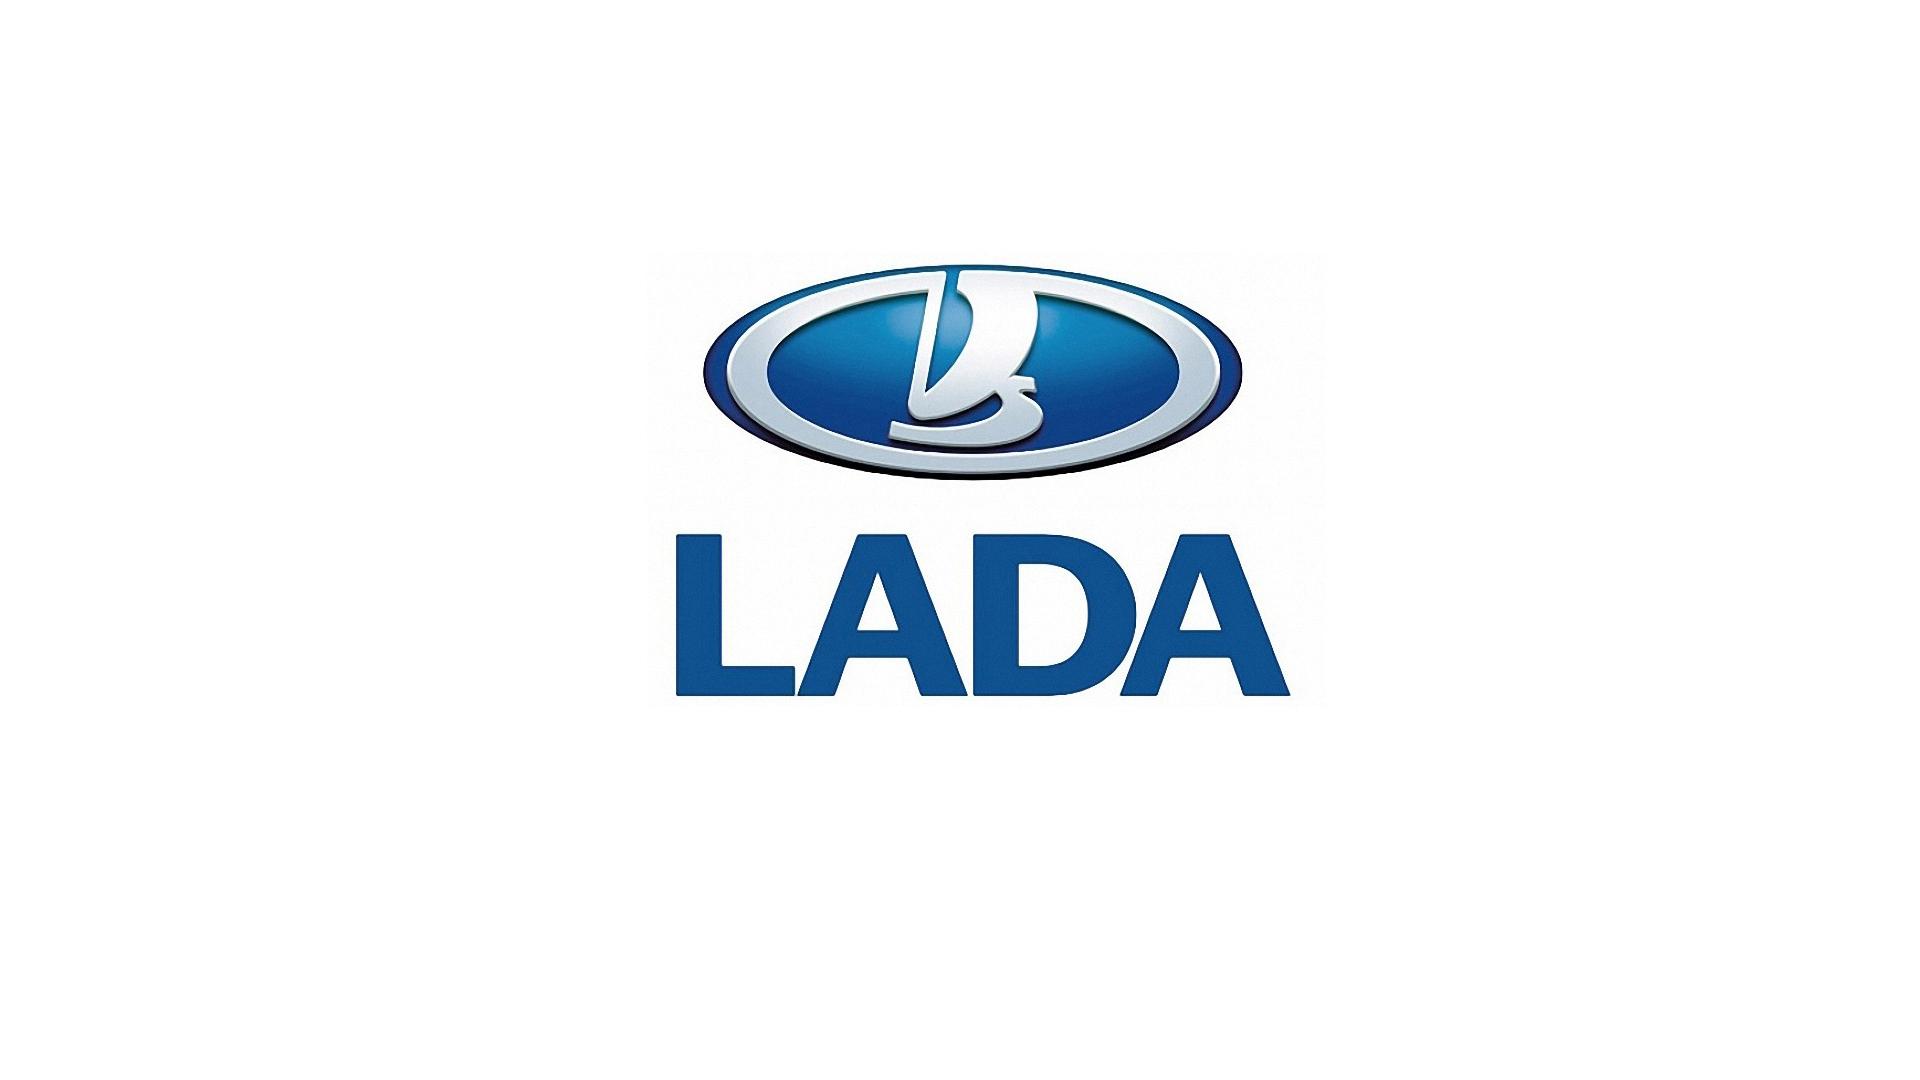 Широкоформатные обои Lada логотип, Lada ...: www.fullhdoboi.ru/photo/brands/lada_logo/31-0-4700